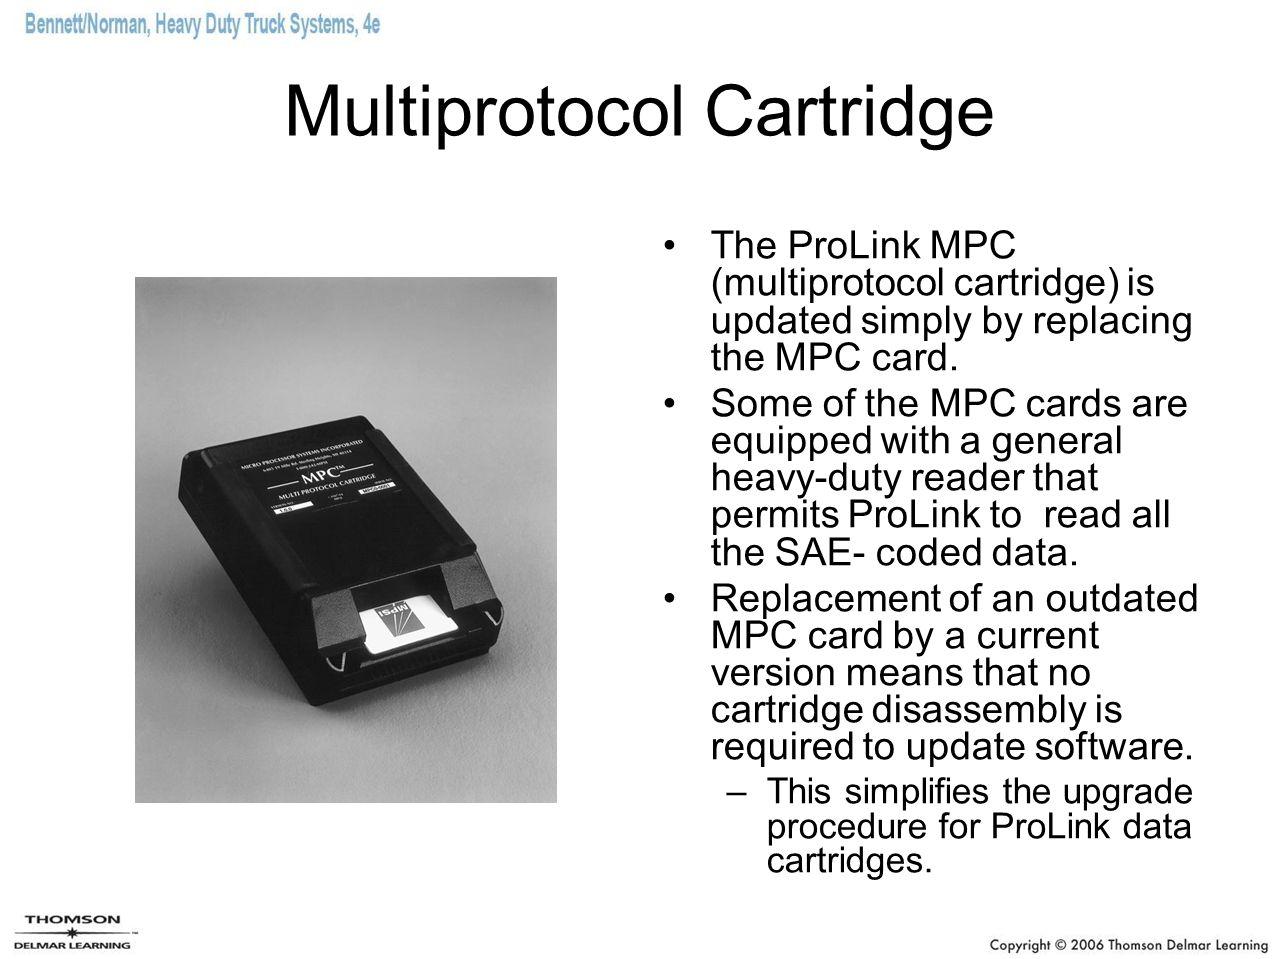 Multiprotocol Cartridge